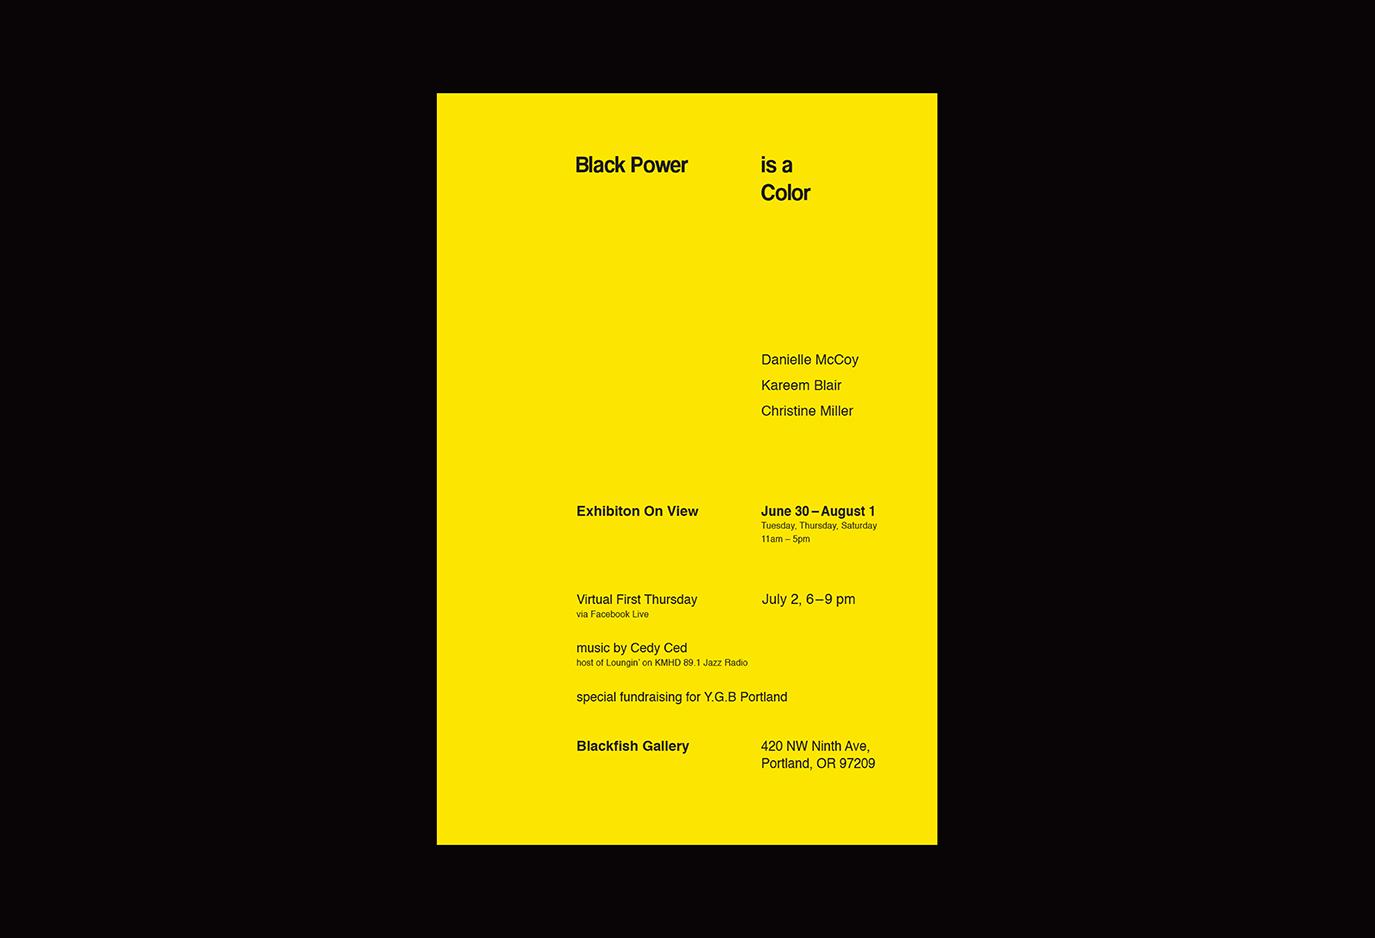 BPIAC_Opening_Flyer_